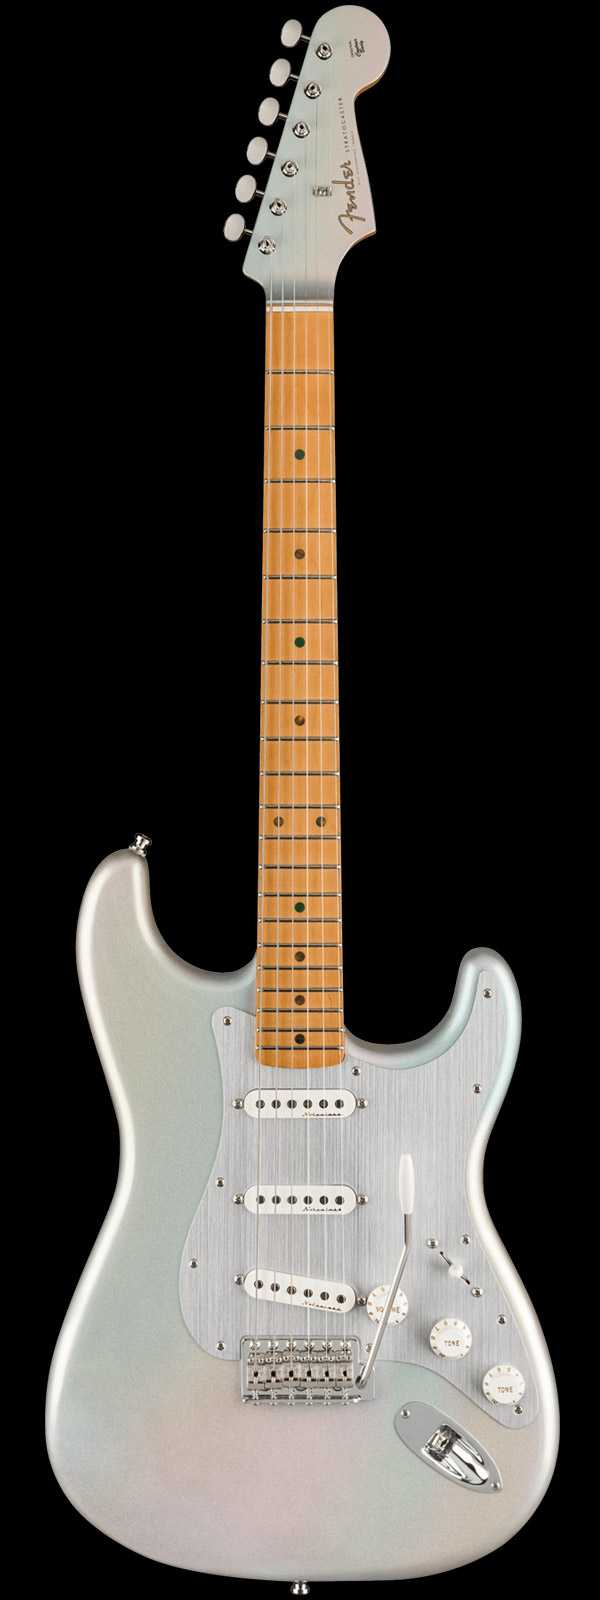 Fender H.E.R. Stratocaster Maple Fingerboard Chrome Glow